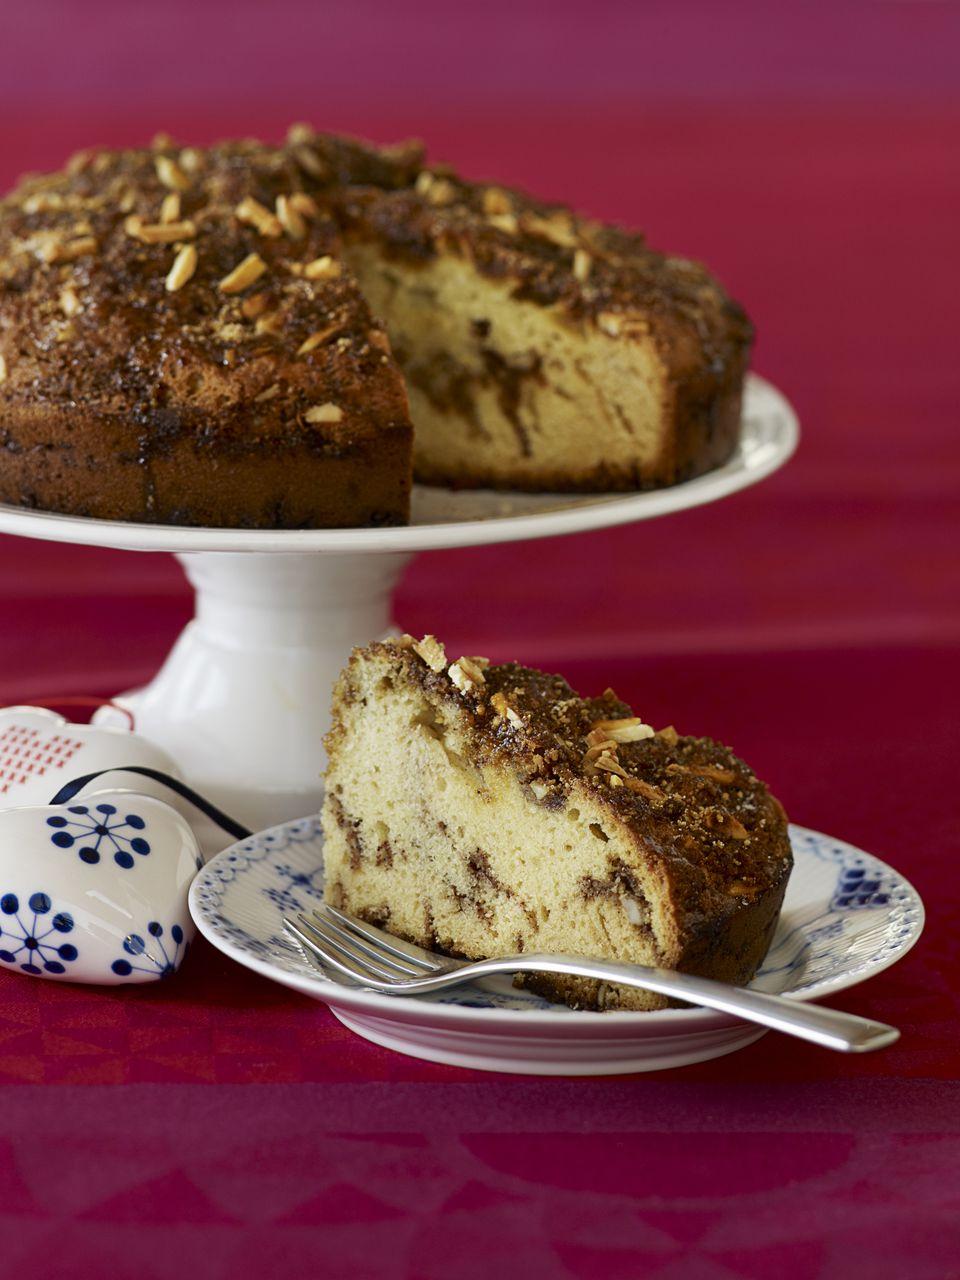 Danish Almond Streusel Cake